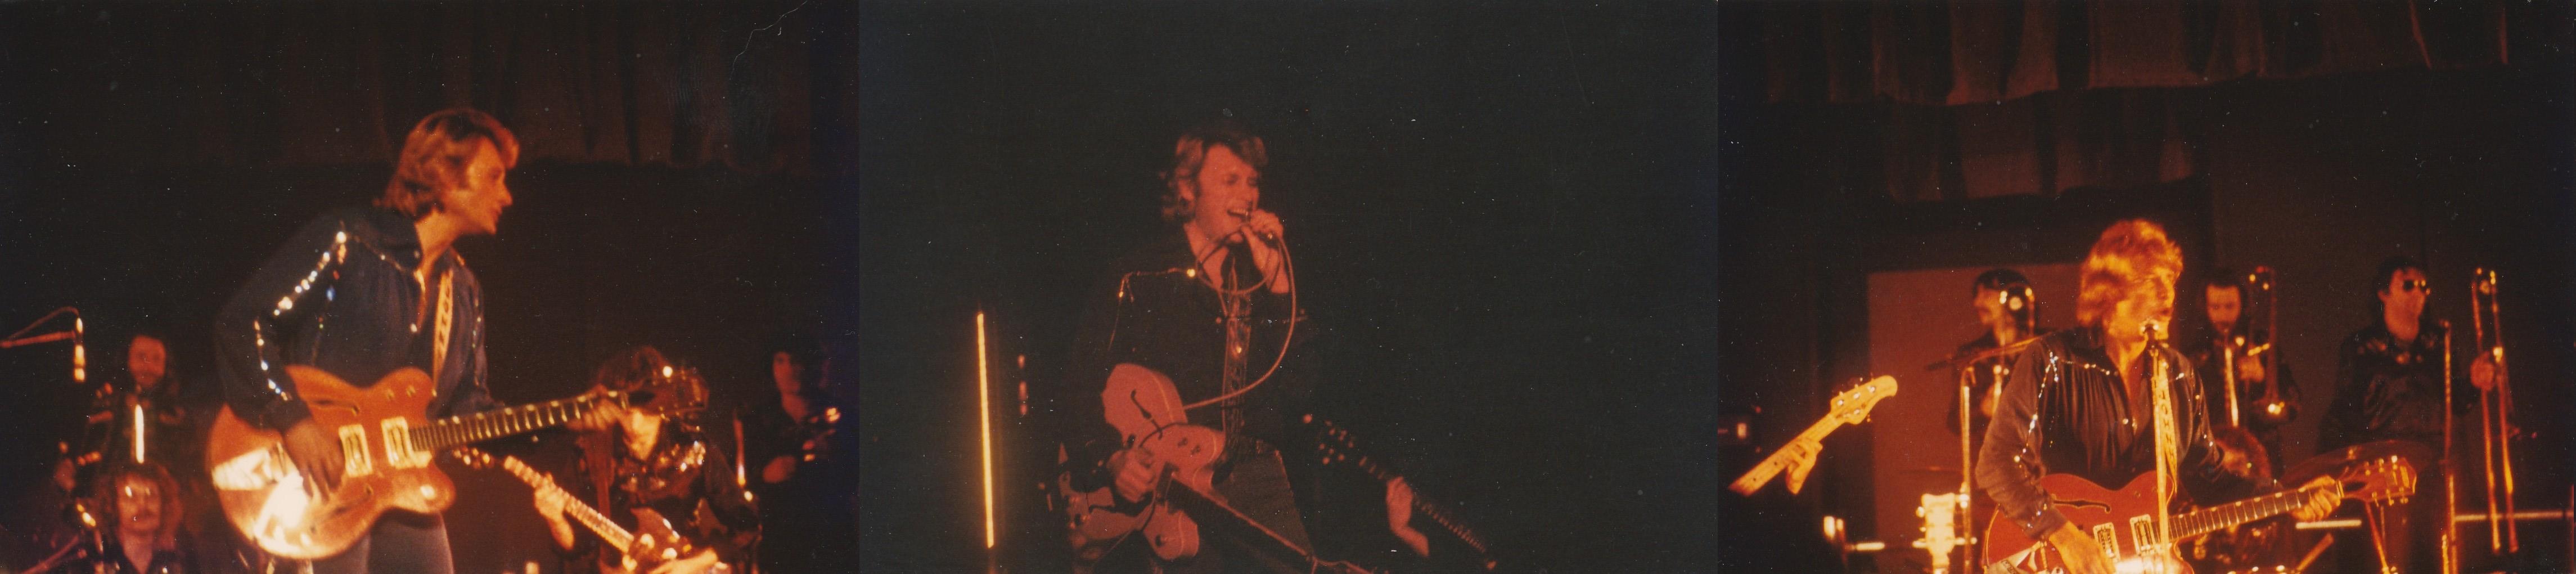 INÉDIT  :  JOHNNY HALLYDAY EN TOURNEE - HIVER 1978 -1979 ( PHOTOS INÉDITES )   0434